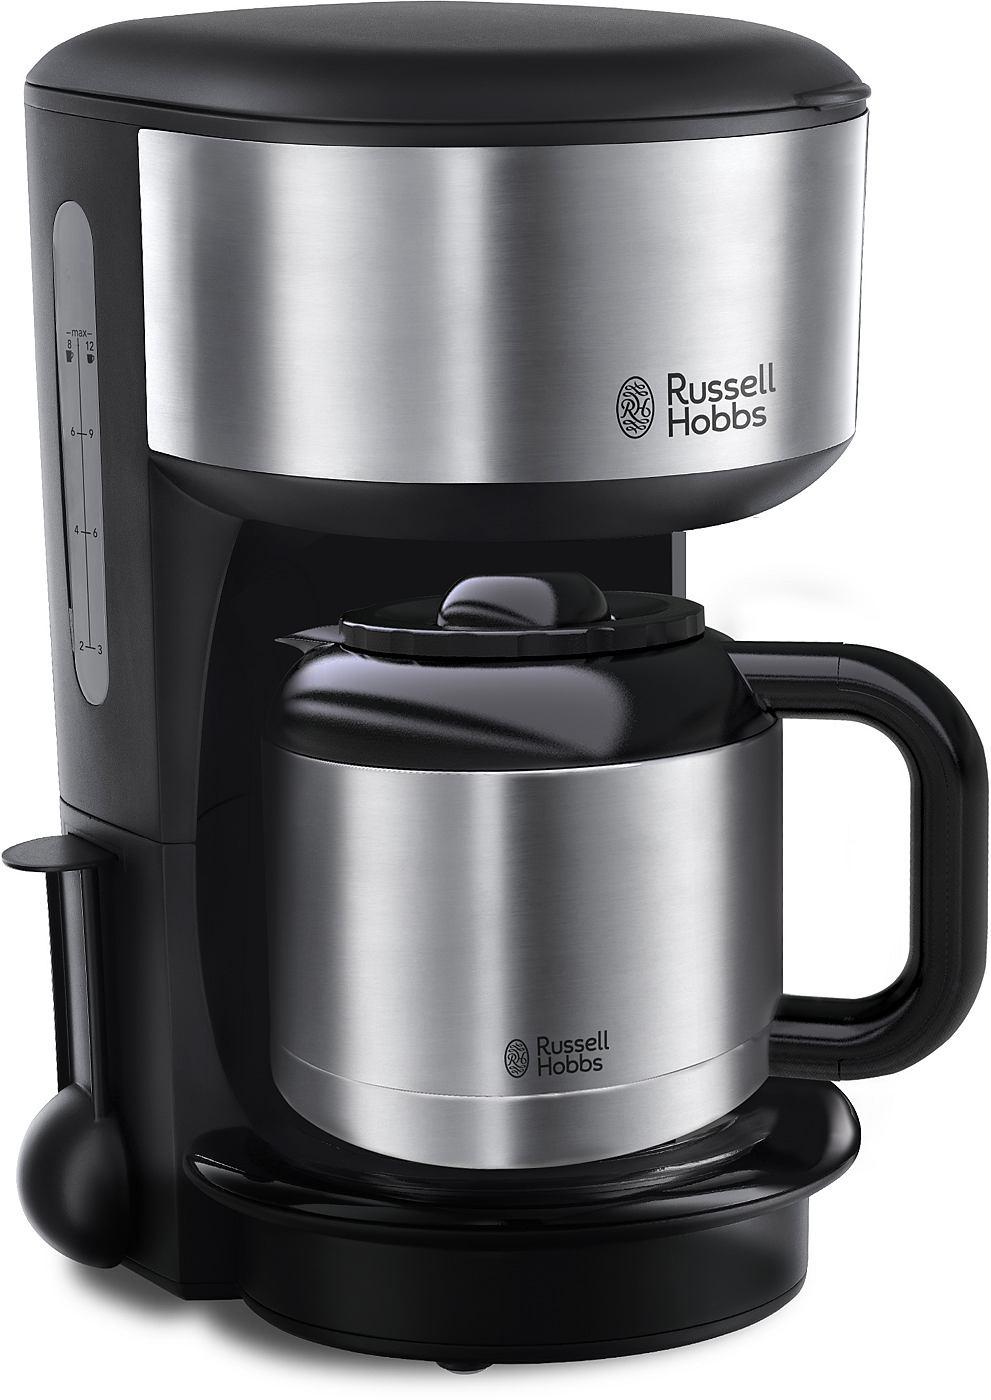 Russell Hobbs Thermo-Kaffeemaschine »Oxford« 20140-56